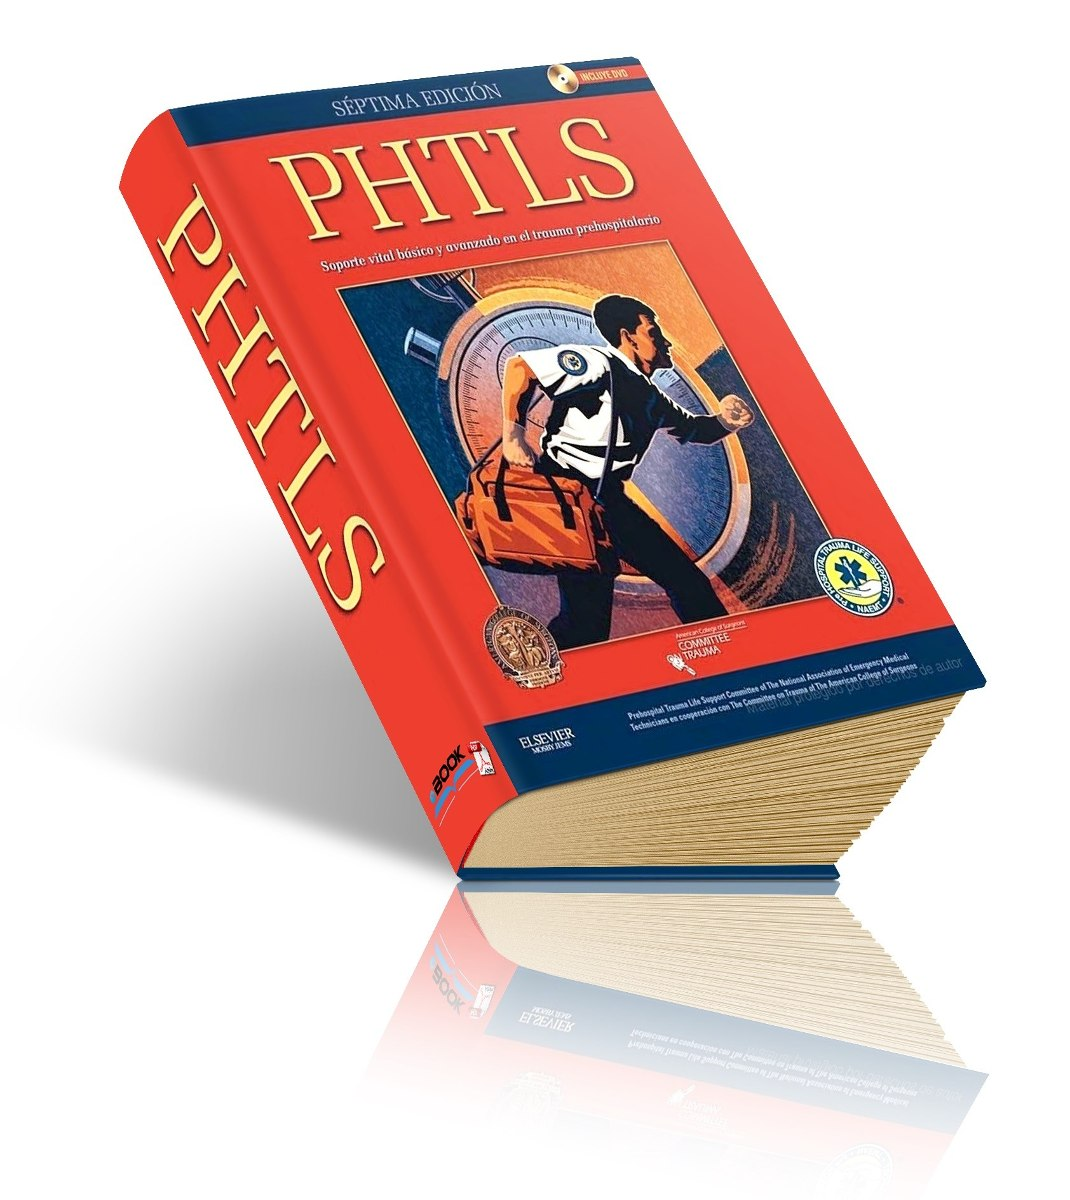 manual phtls 7 edici n 95 00 en mercado libre rh articulo mercadolibre com mx Phtls Instructor Phtls 7th Edition Test Answers